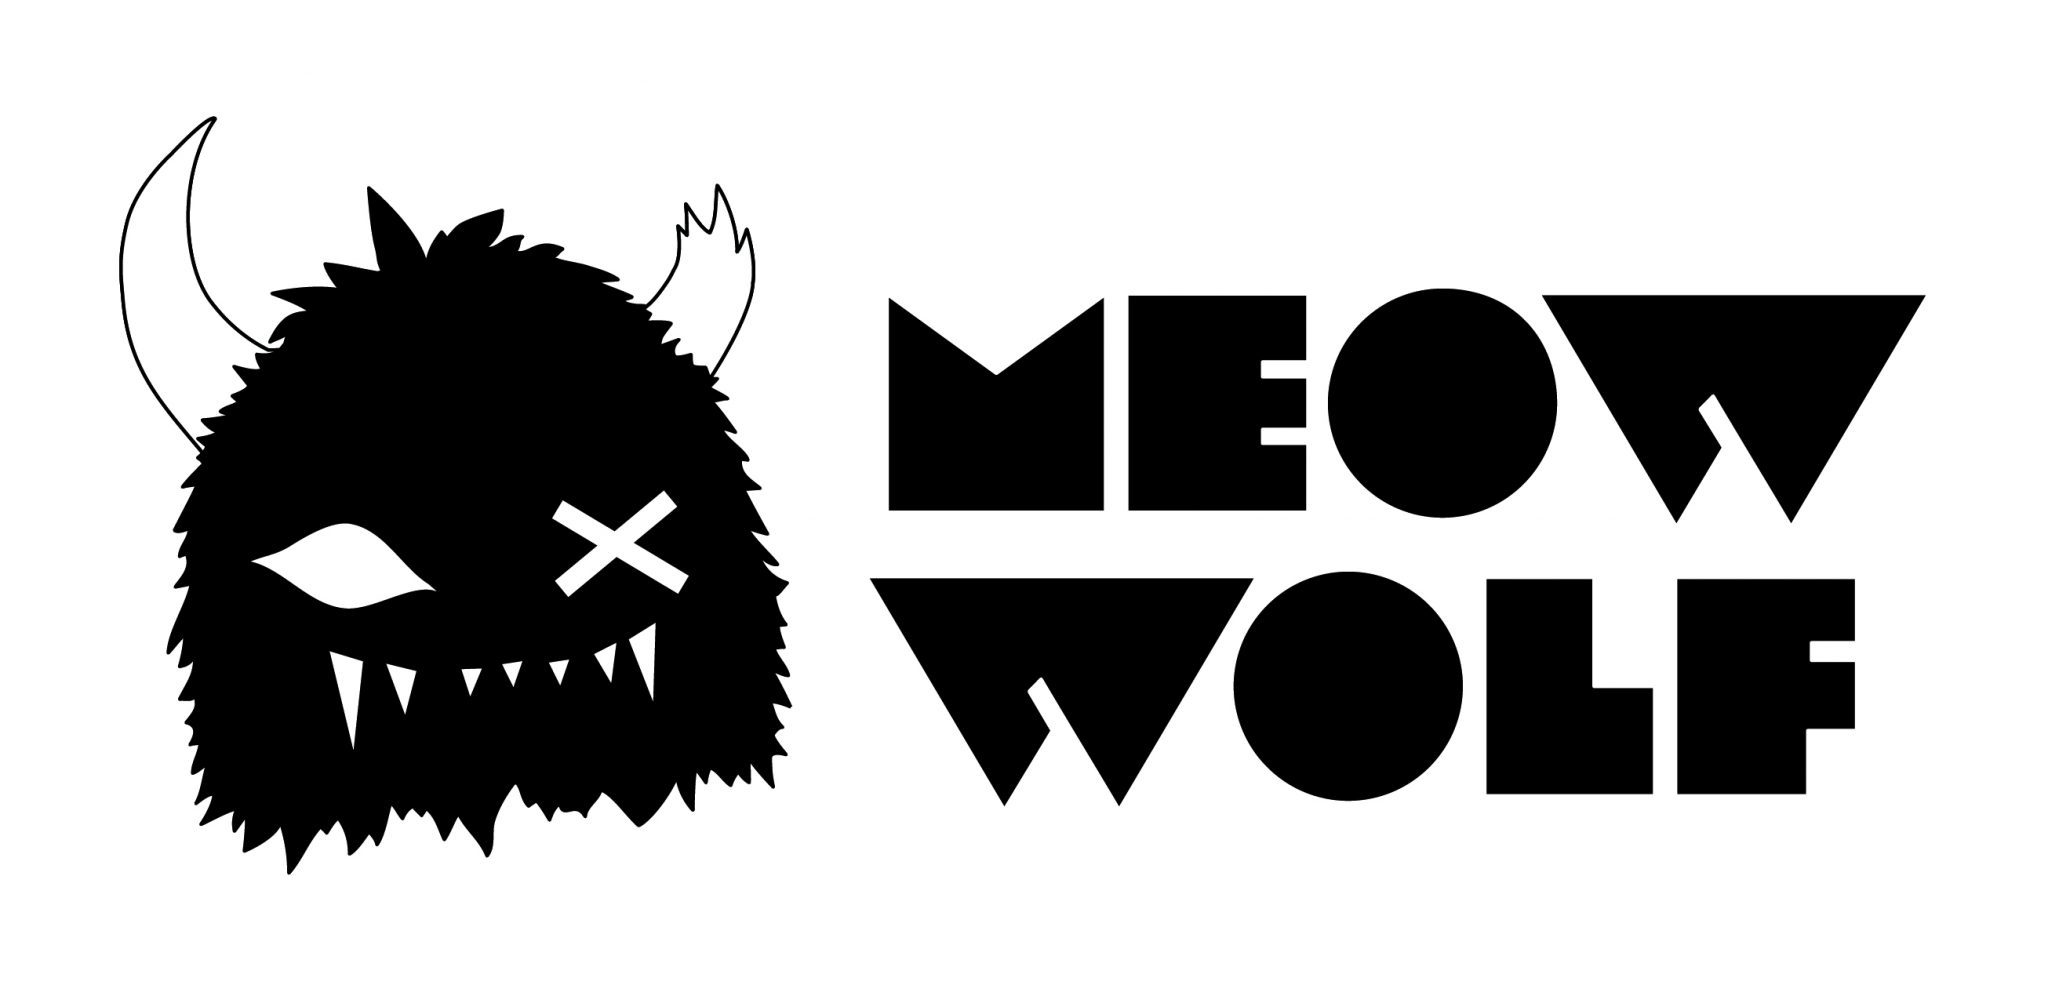 meow-wolf-snaggy-logo-horizontal-bw.jpg